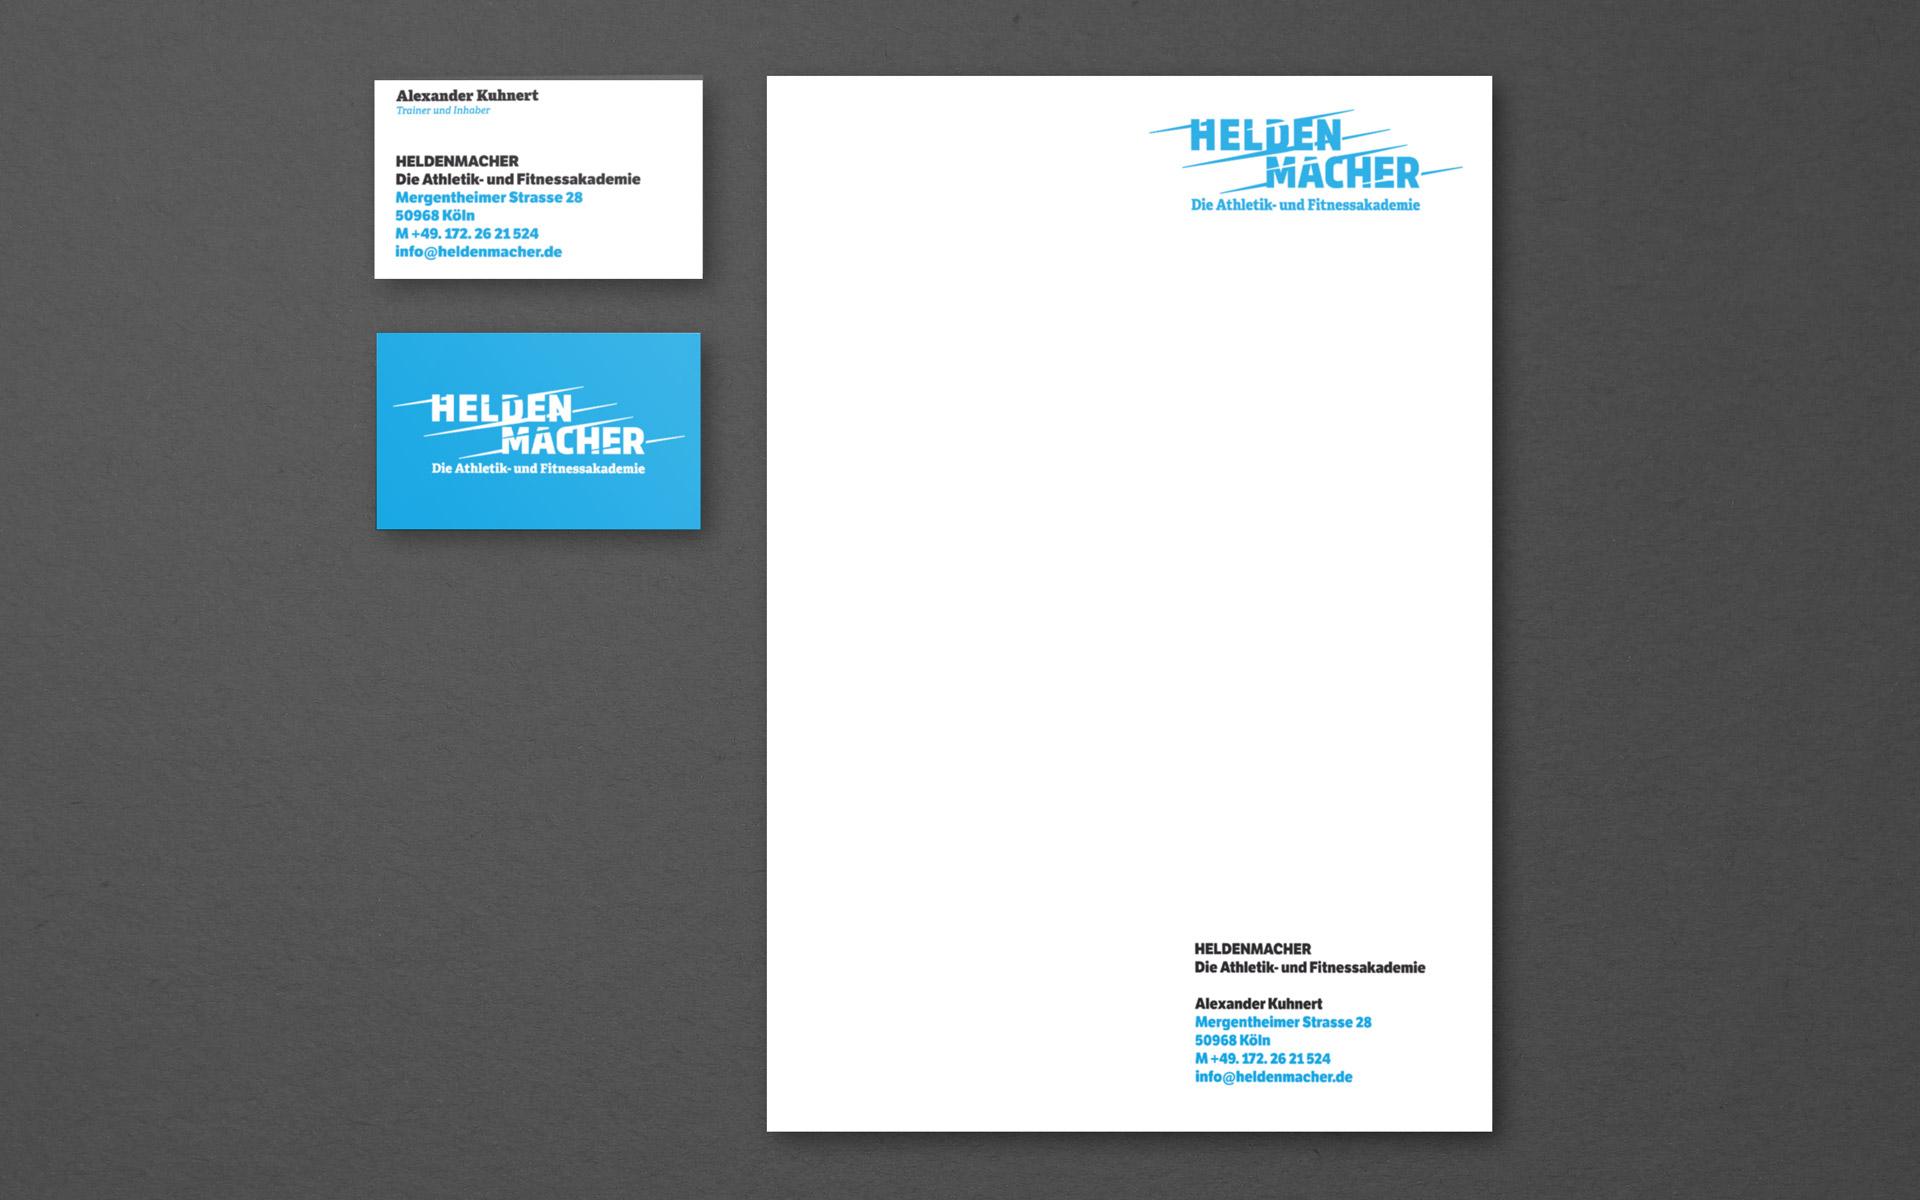 Heldenmacher Corporate Design & Website, Briefbogen und Visitenkarte